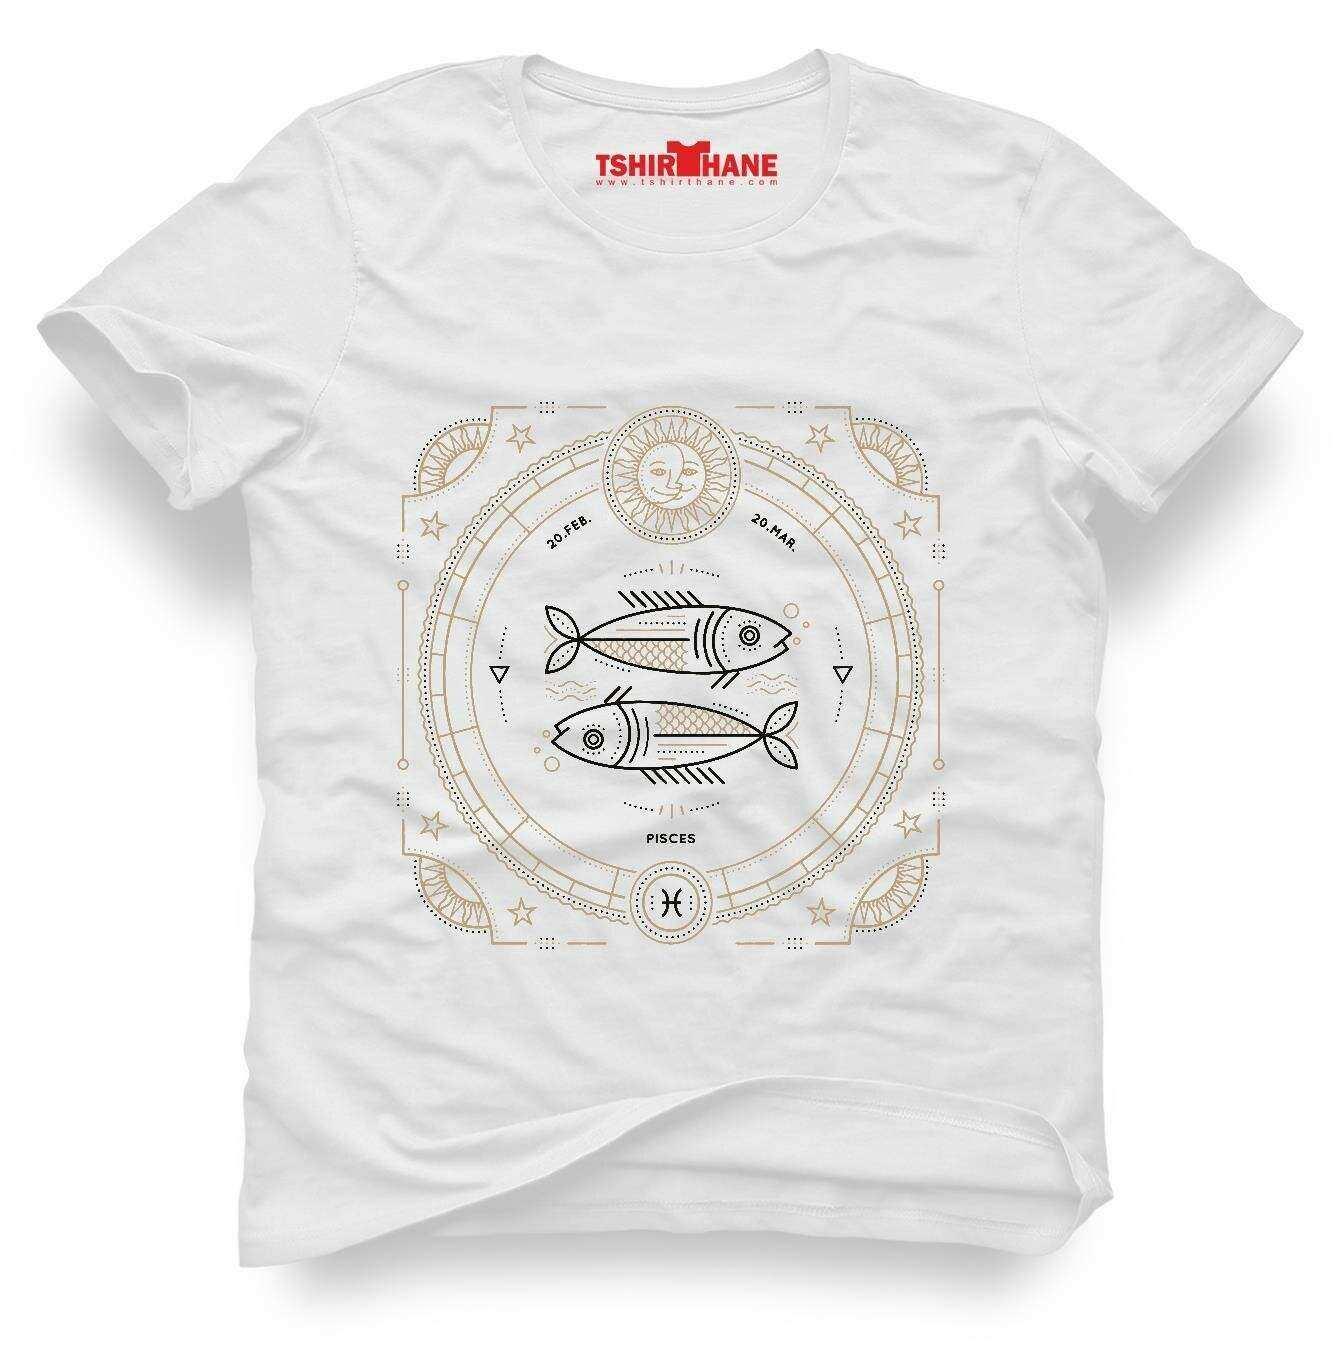 Tshirthane Balık Burcu Pisces Tişört Erkek Tshirt